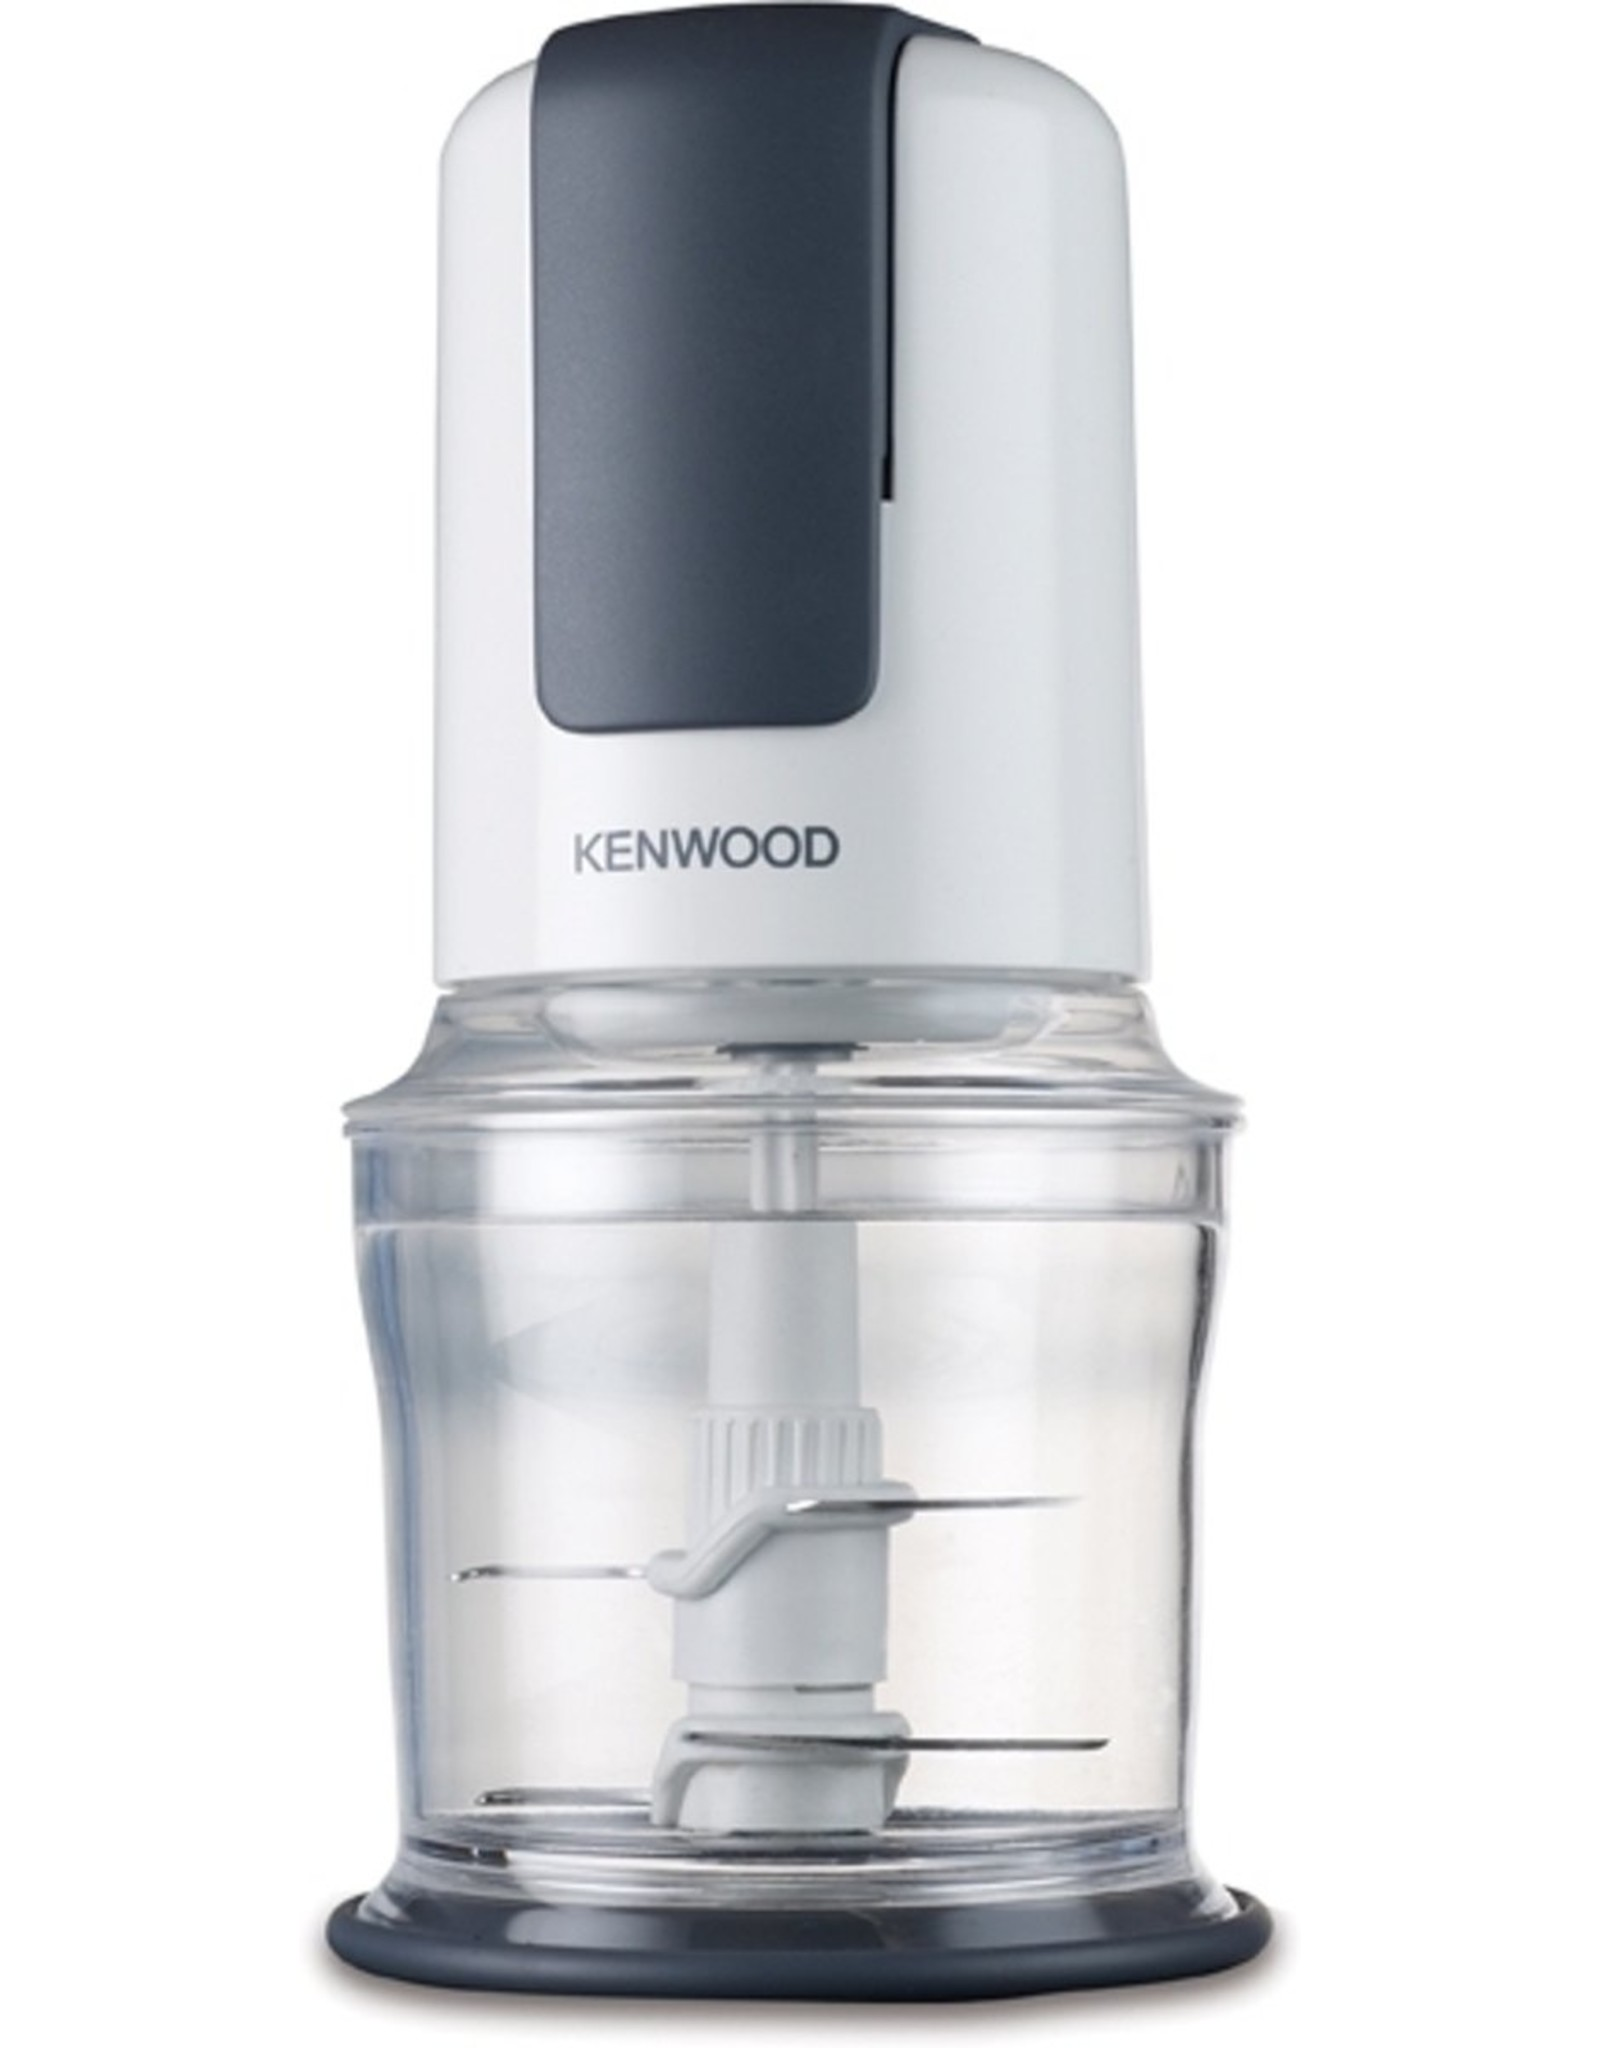 Kenwood Kenwood CH580 0.5l 450W Wit elektrische hakmolen